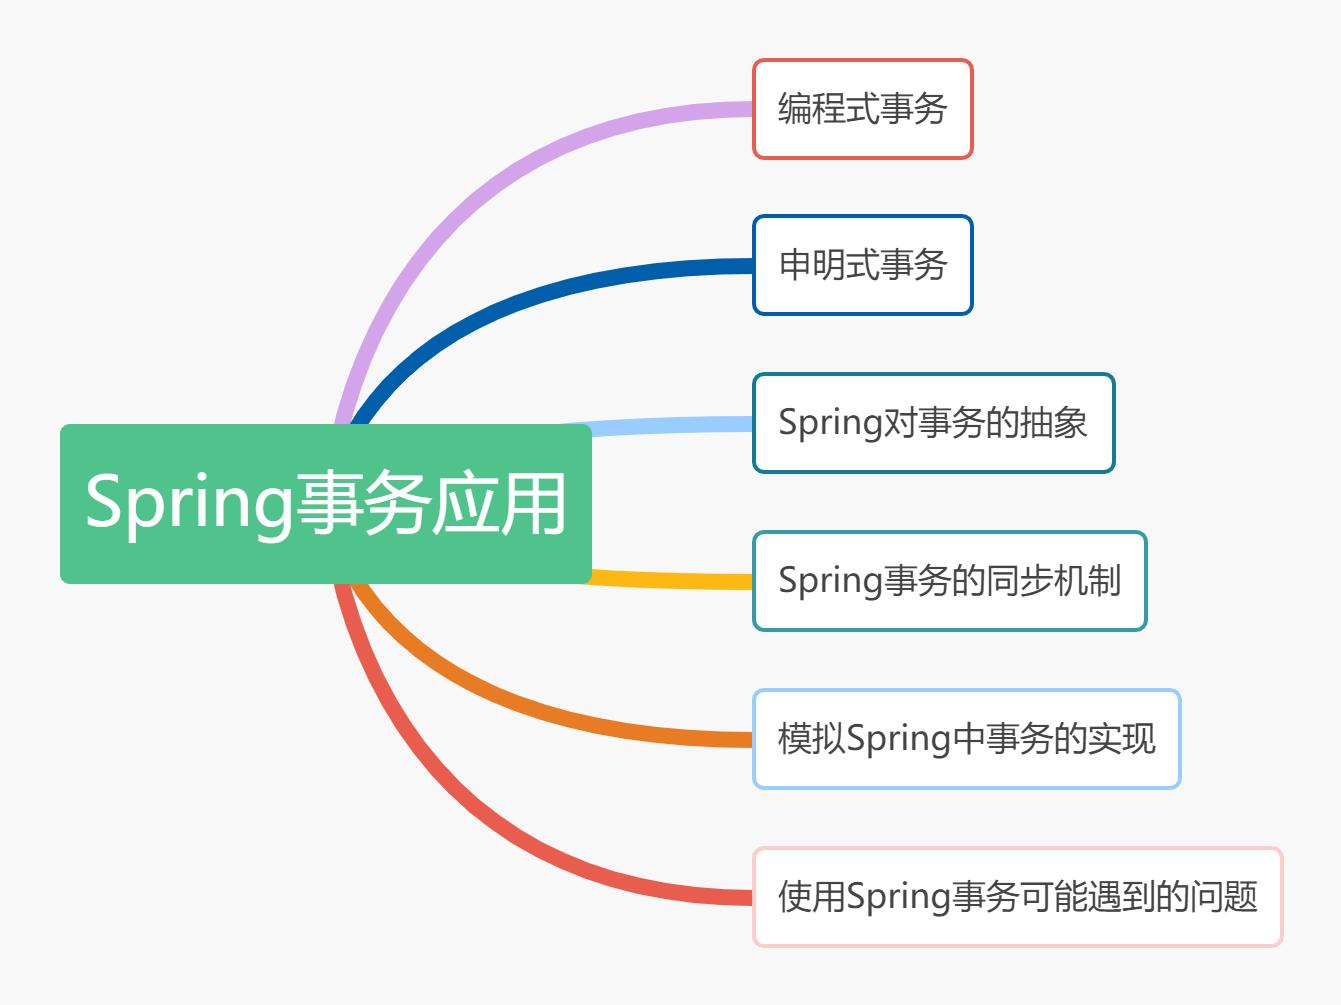 Spring事务应用大纲